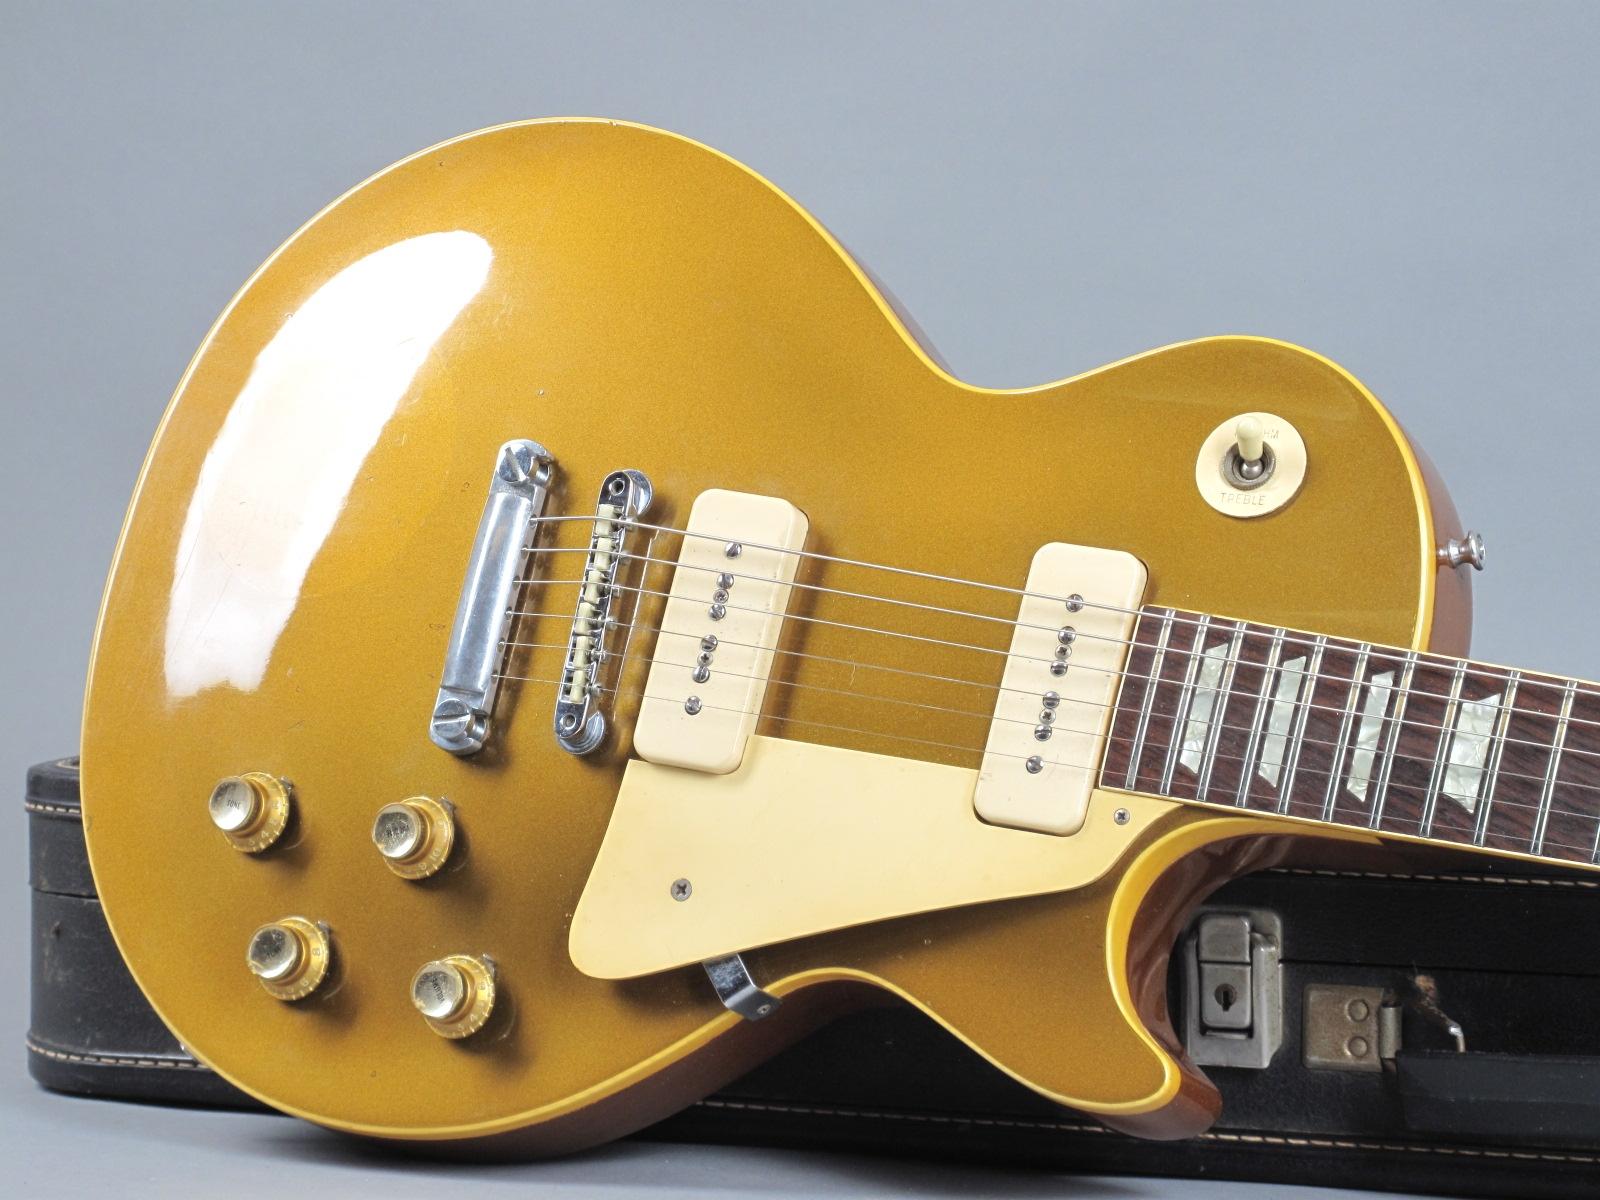 https://guitarpoint.de/app/uploads/products/1969-gibson-les-paul-standard-goldtop-2/1969-Gibson-Les-Paul-Standard-Goldtop-558833-19.jpg